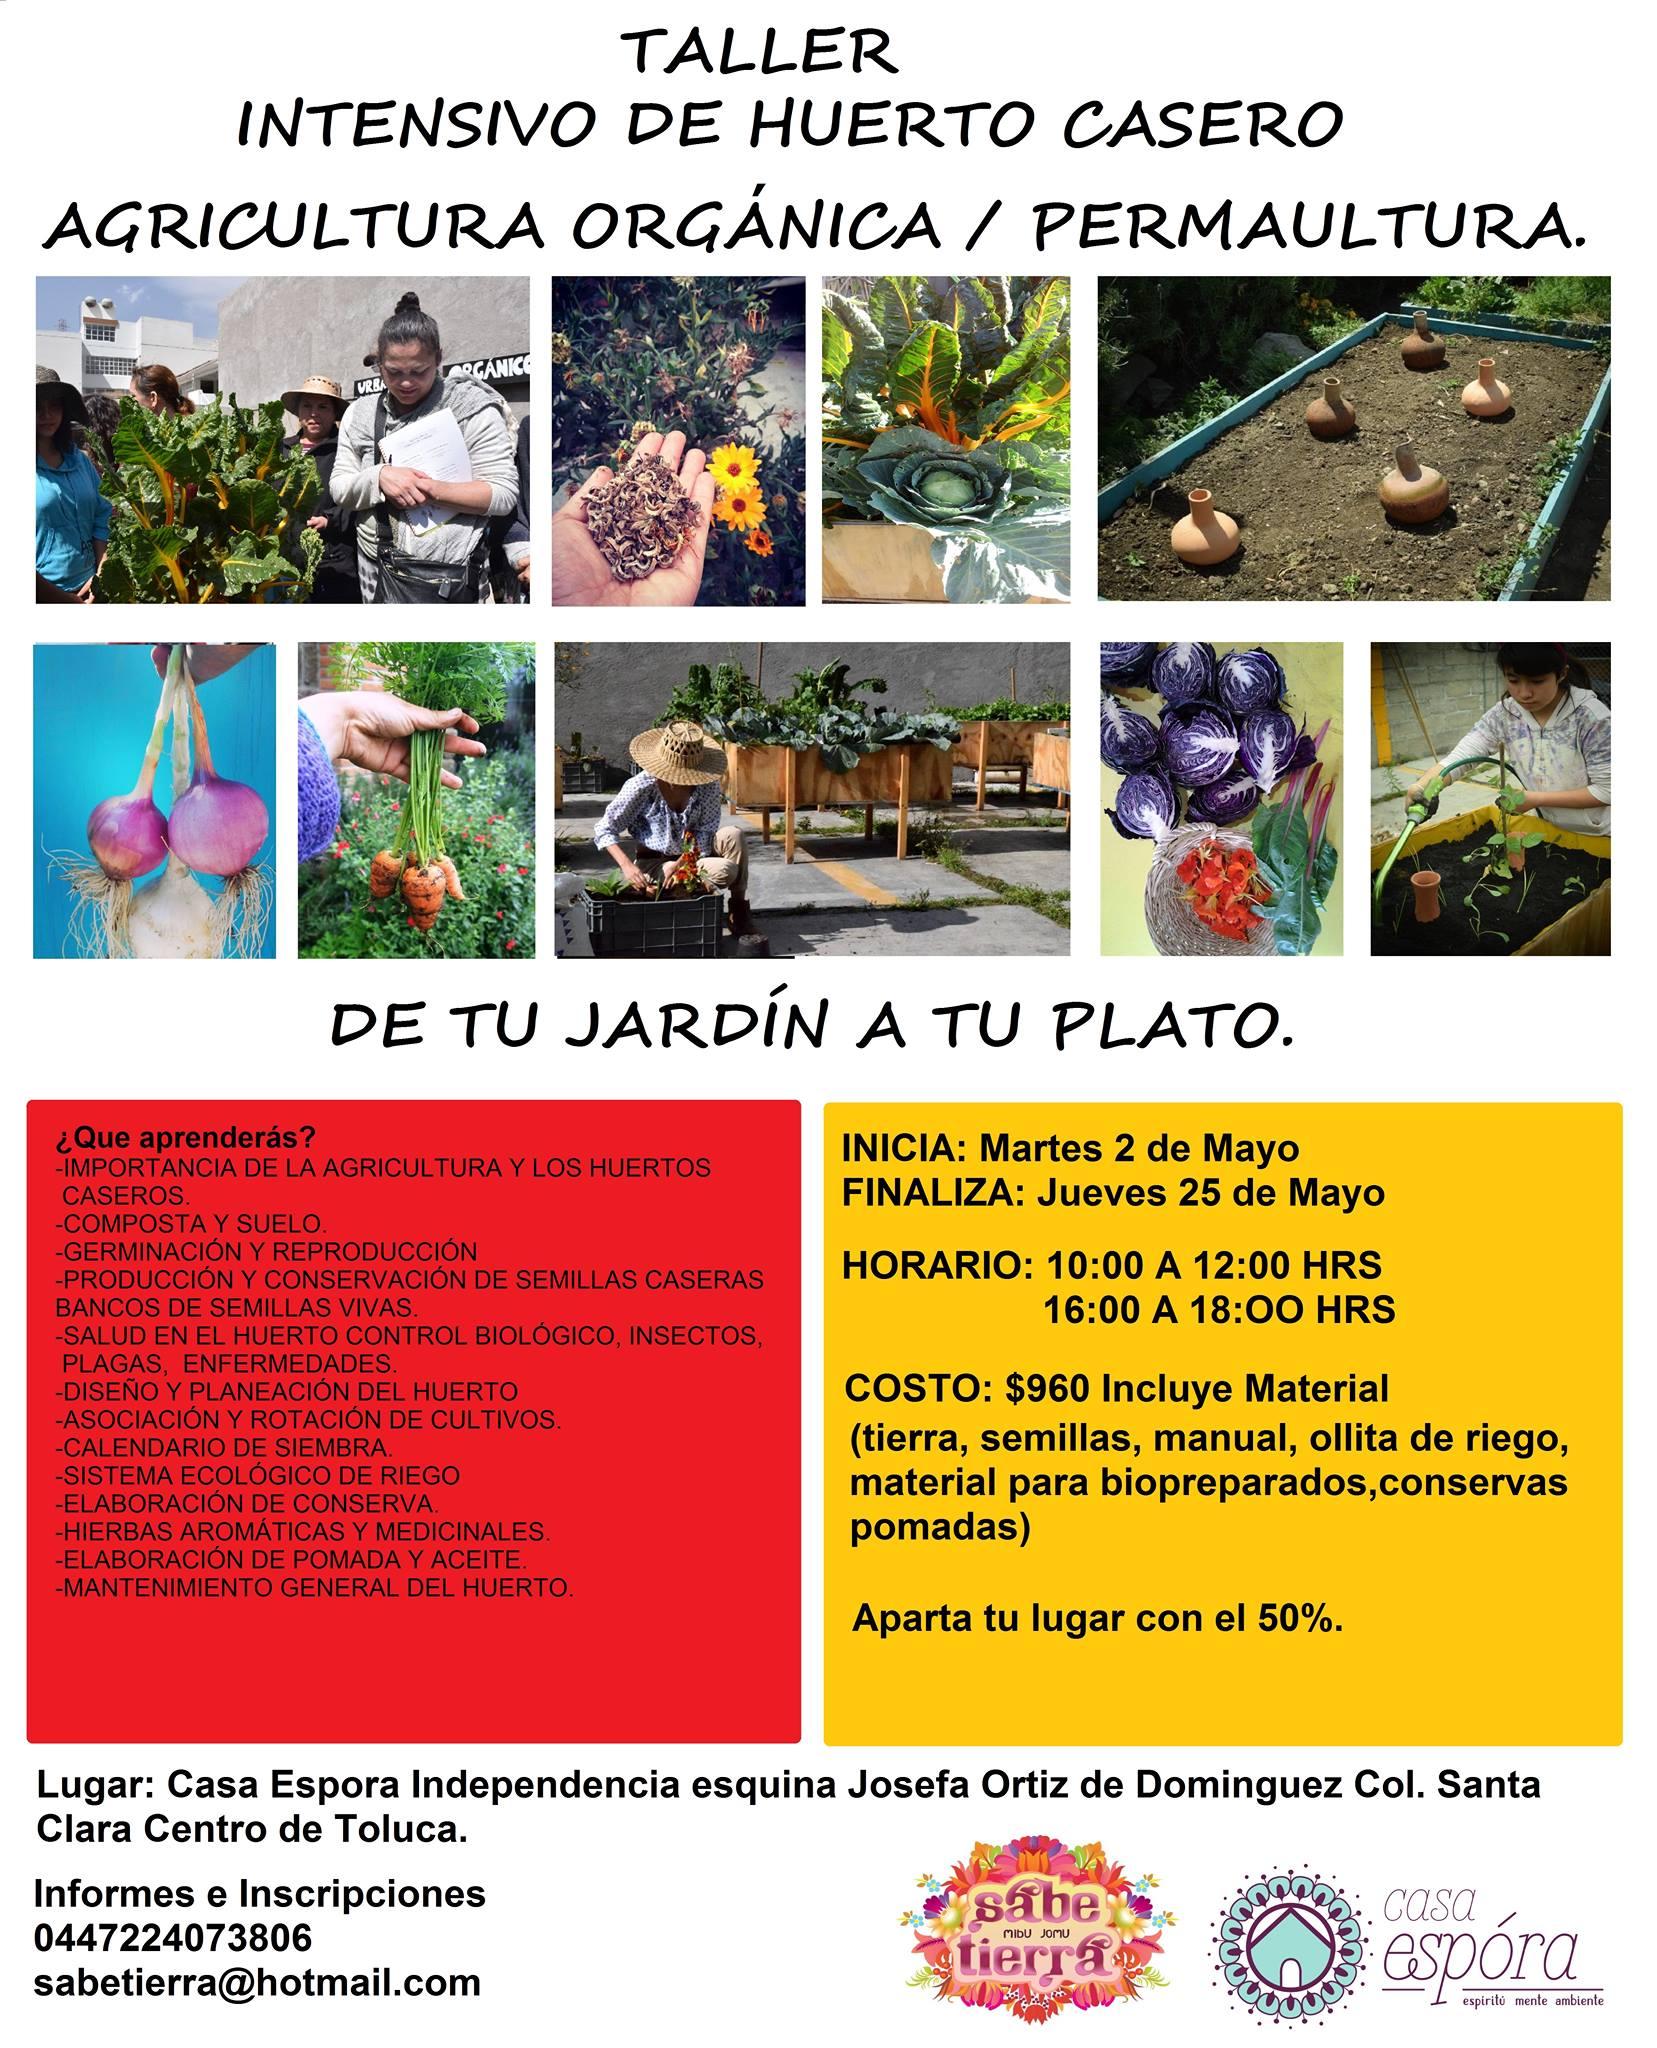 taller intensivo huerto casero agricultura orgnica permacultur toluca cultural